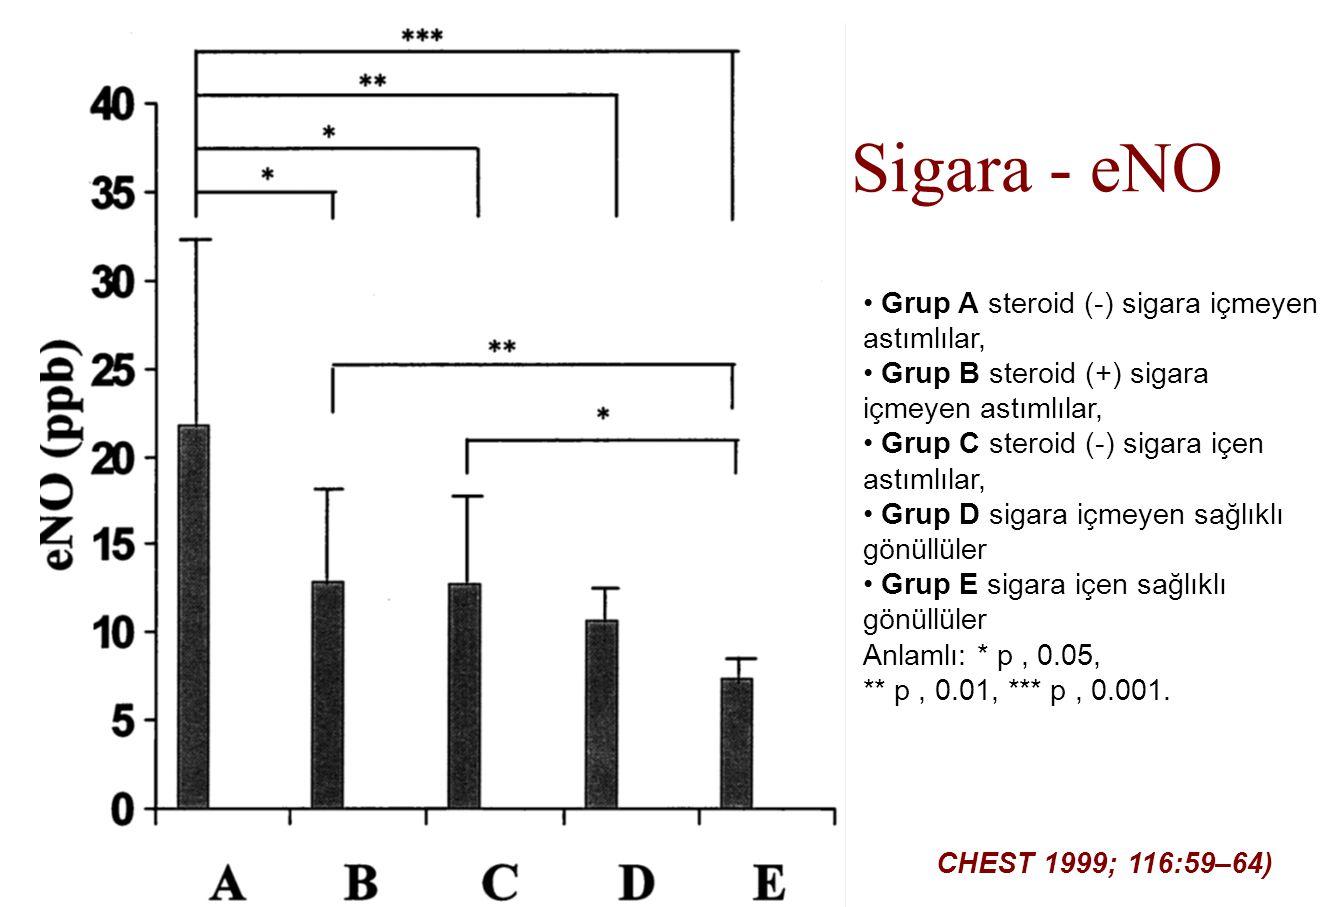 Sigara - eNO Grup A steroid (-) sigara içmeyen astımlılar,